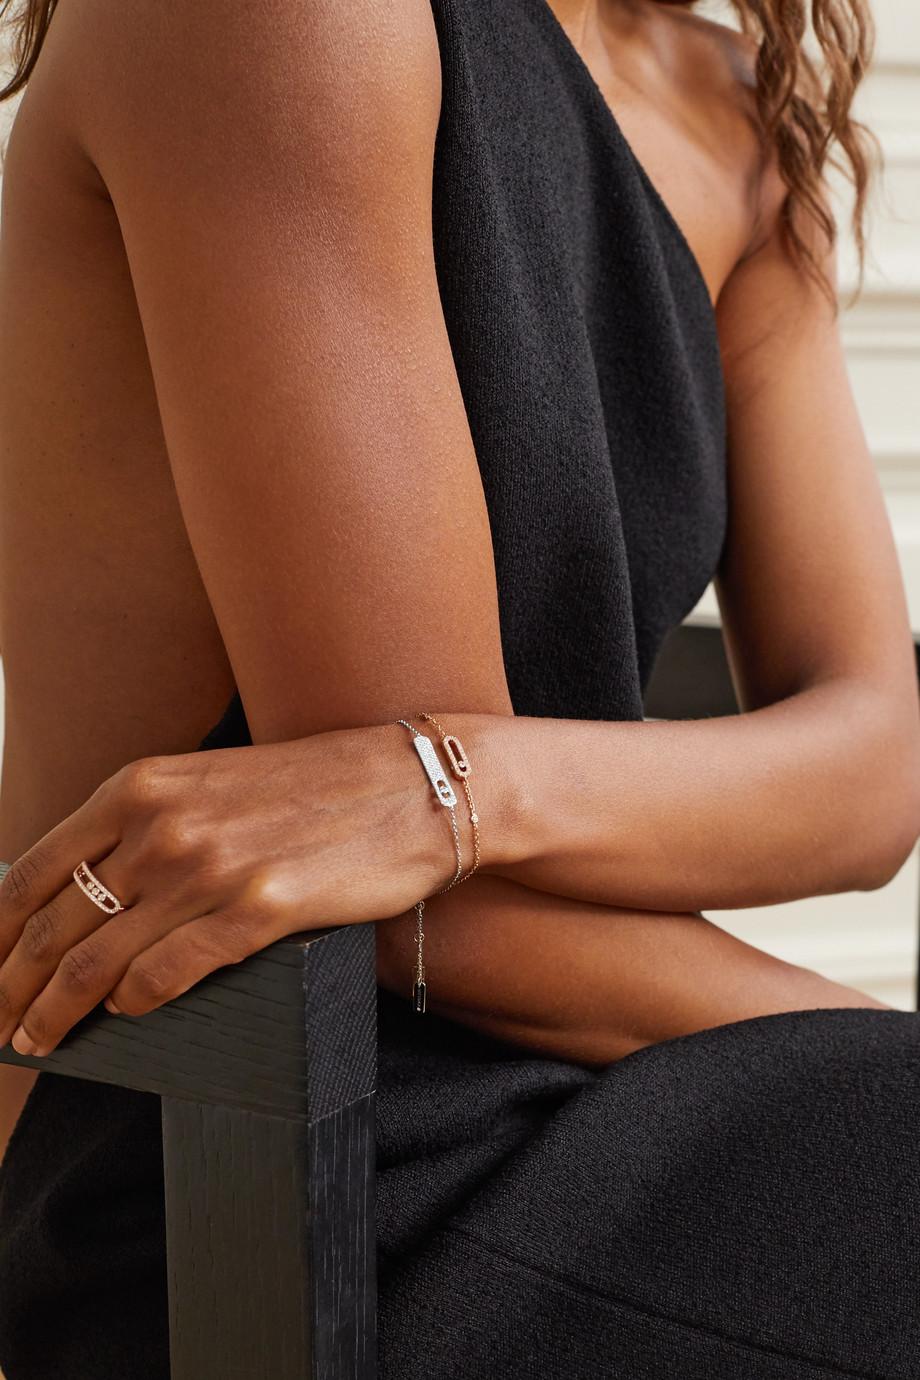 Messika My First Diamond 18-karat white gold diamond bracelet